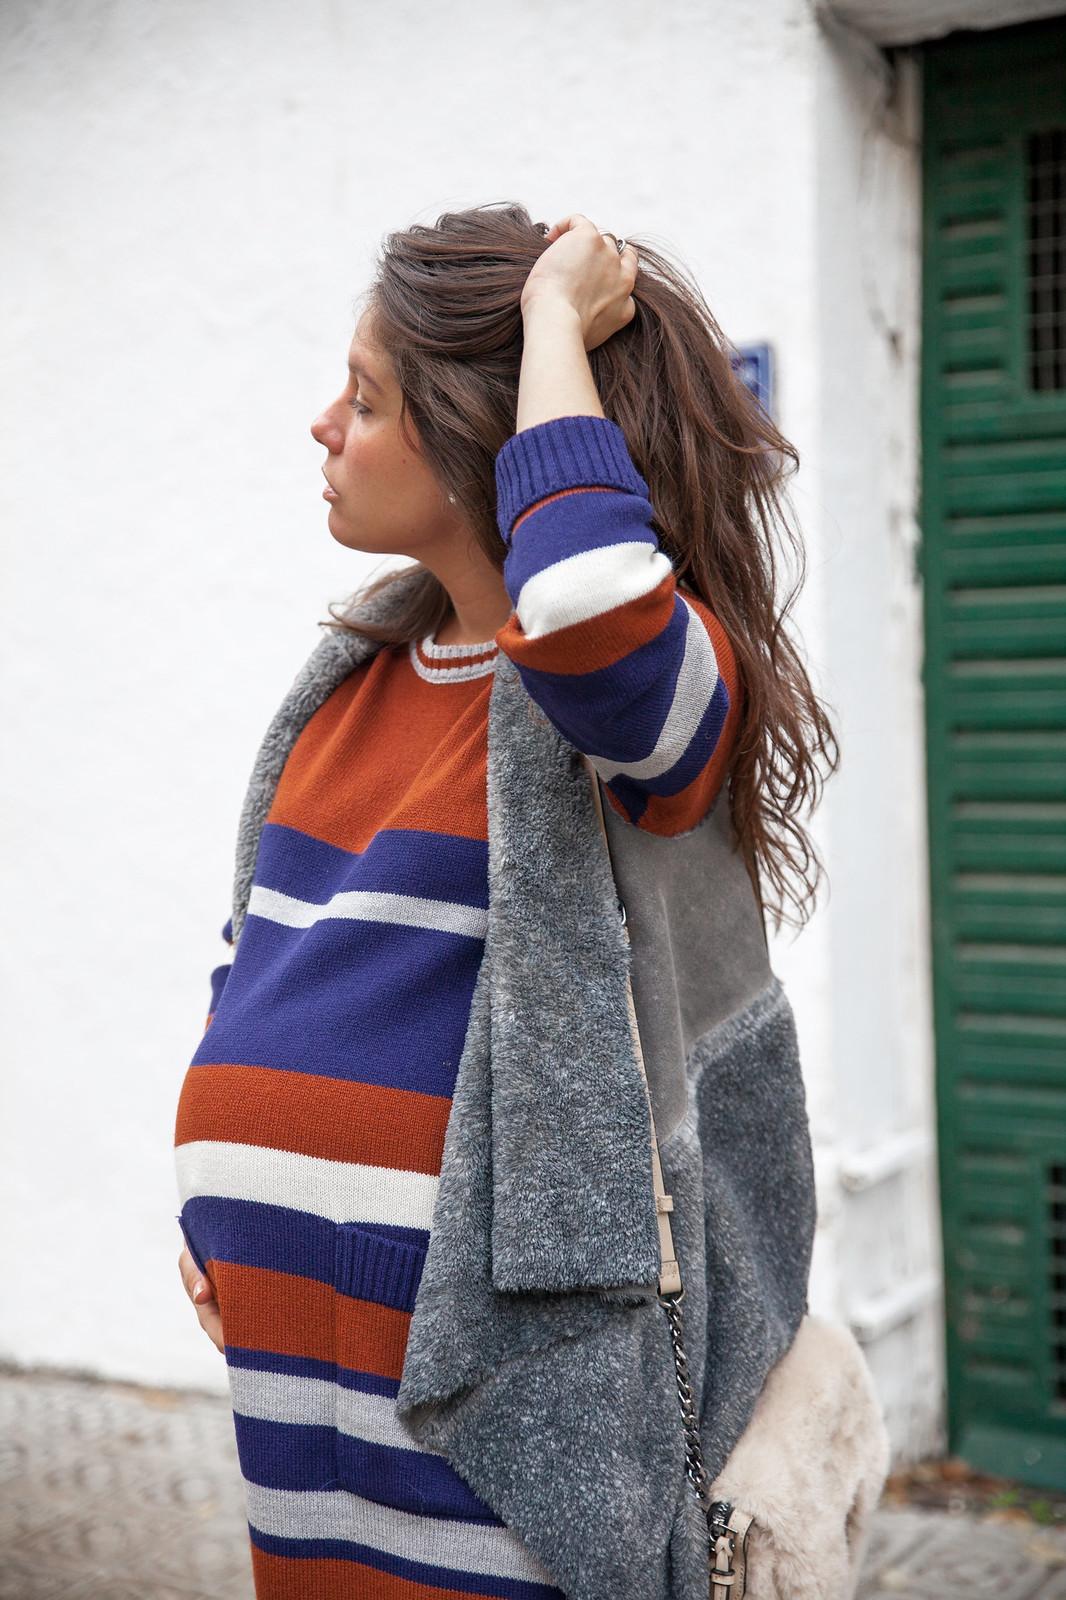 013_como_combinar_Vestido_rayas_punto_chaleco_look_embarazo_tercer_trimestre_theguestgirl_fashion_influencer_fashion_portugal_brand_ruga